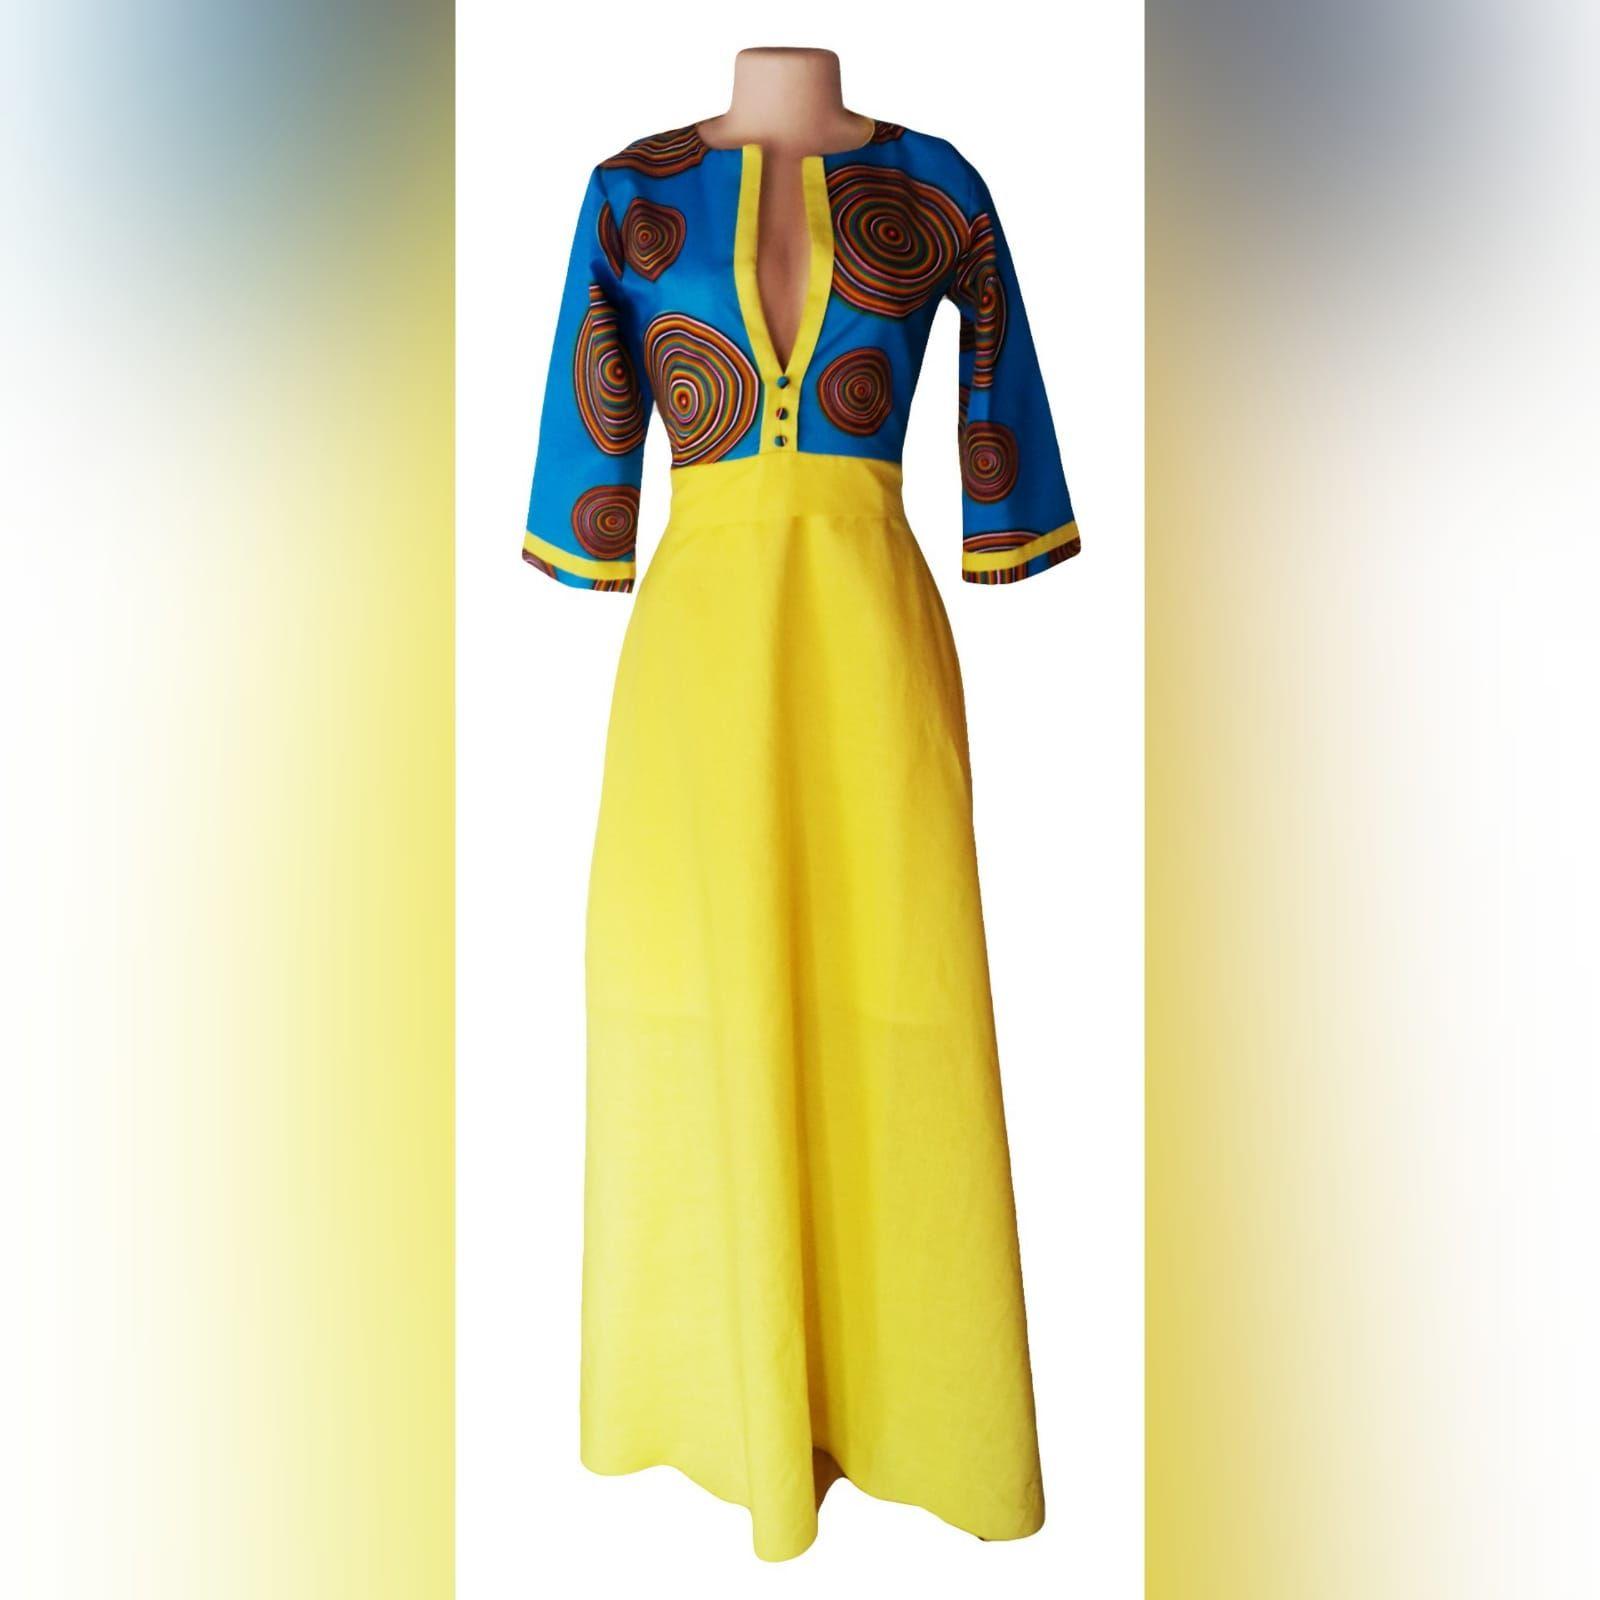 Vestido Tradicional Moderno Azul E Amarelo Traditional Dresses Traditional Outfits African Traditional Dresses [ 1600 x 1600 Pixel ]